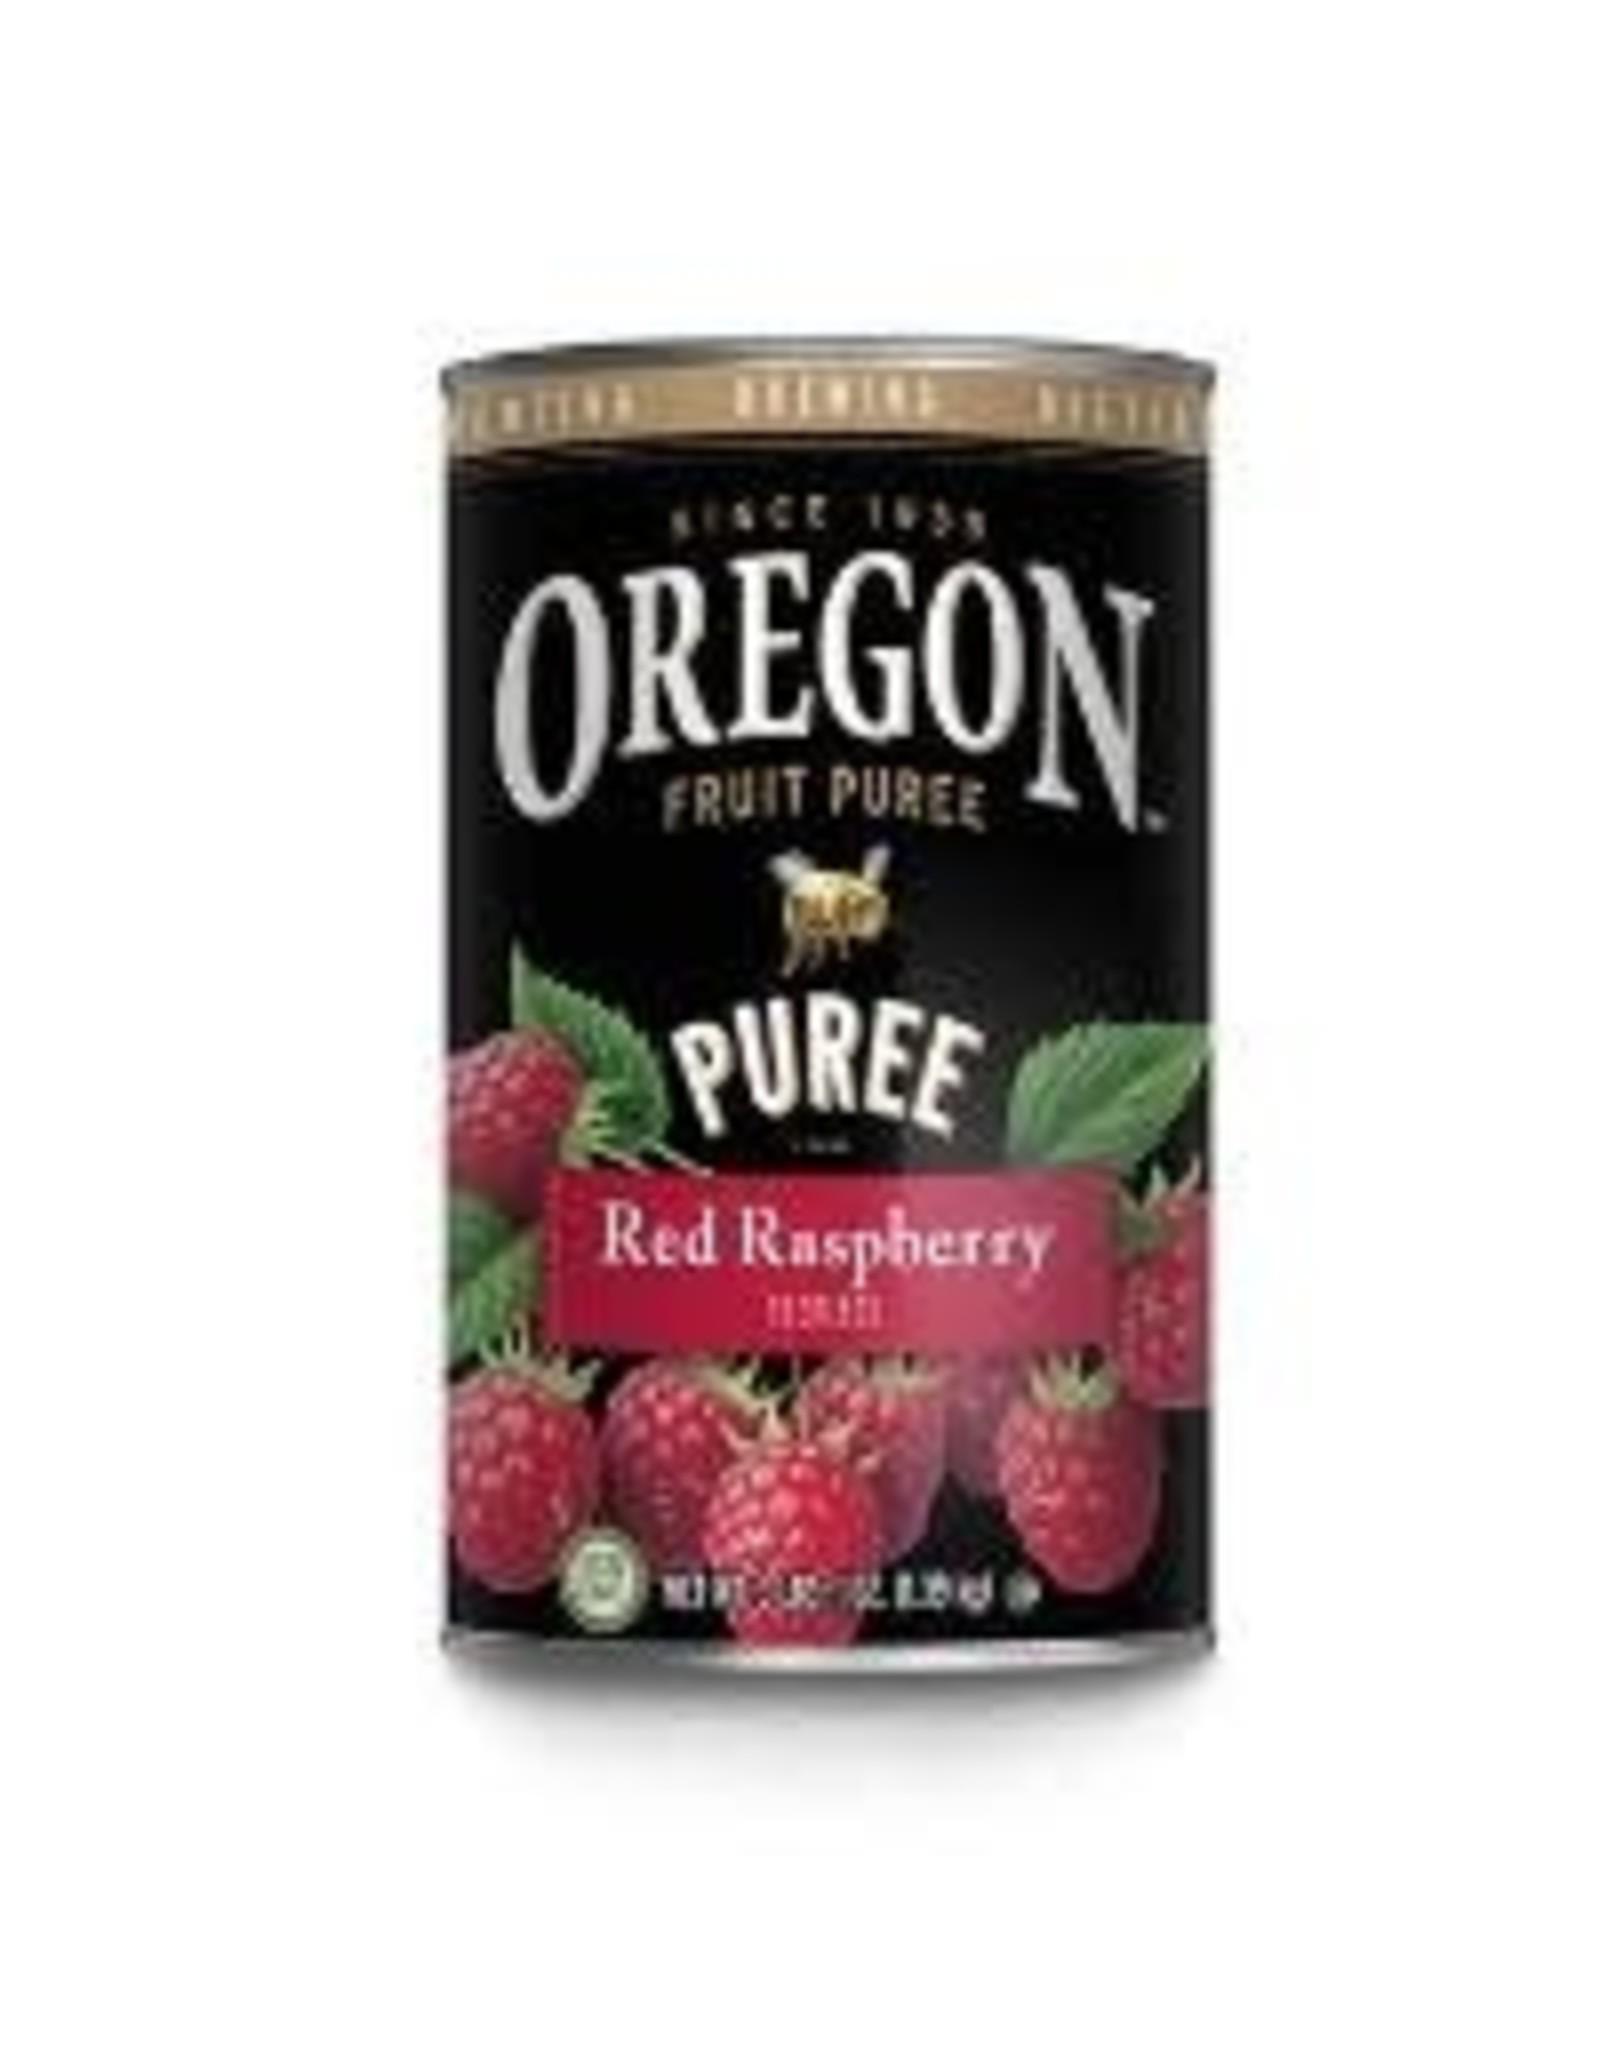 RASPBERRY PUREE 49 OZ OREGON FRUIT